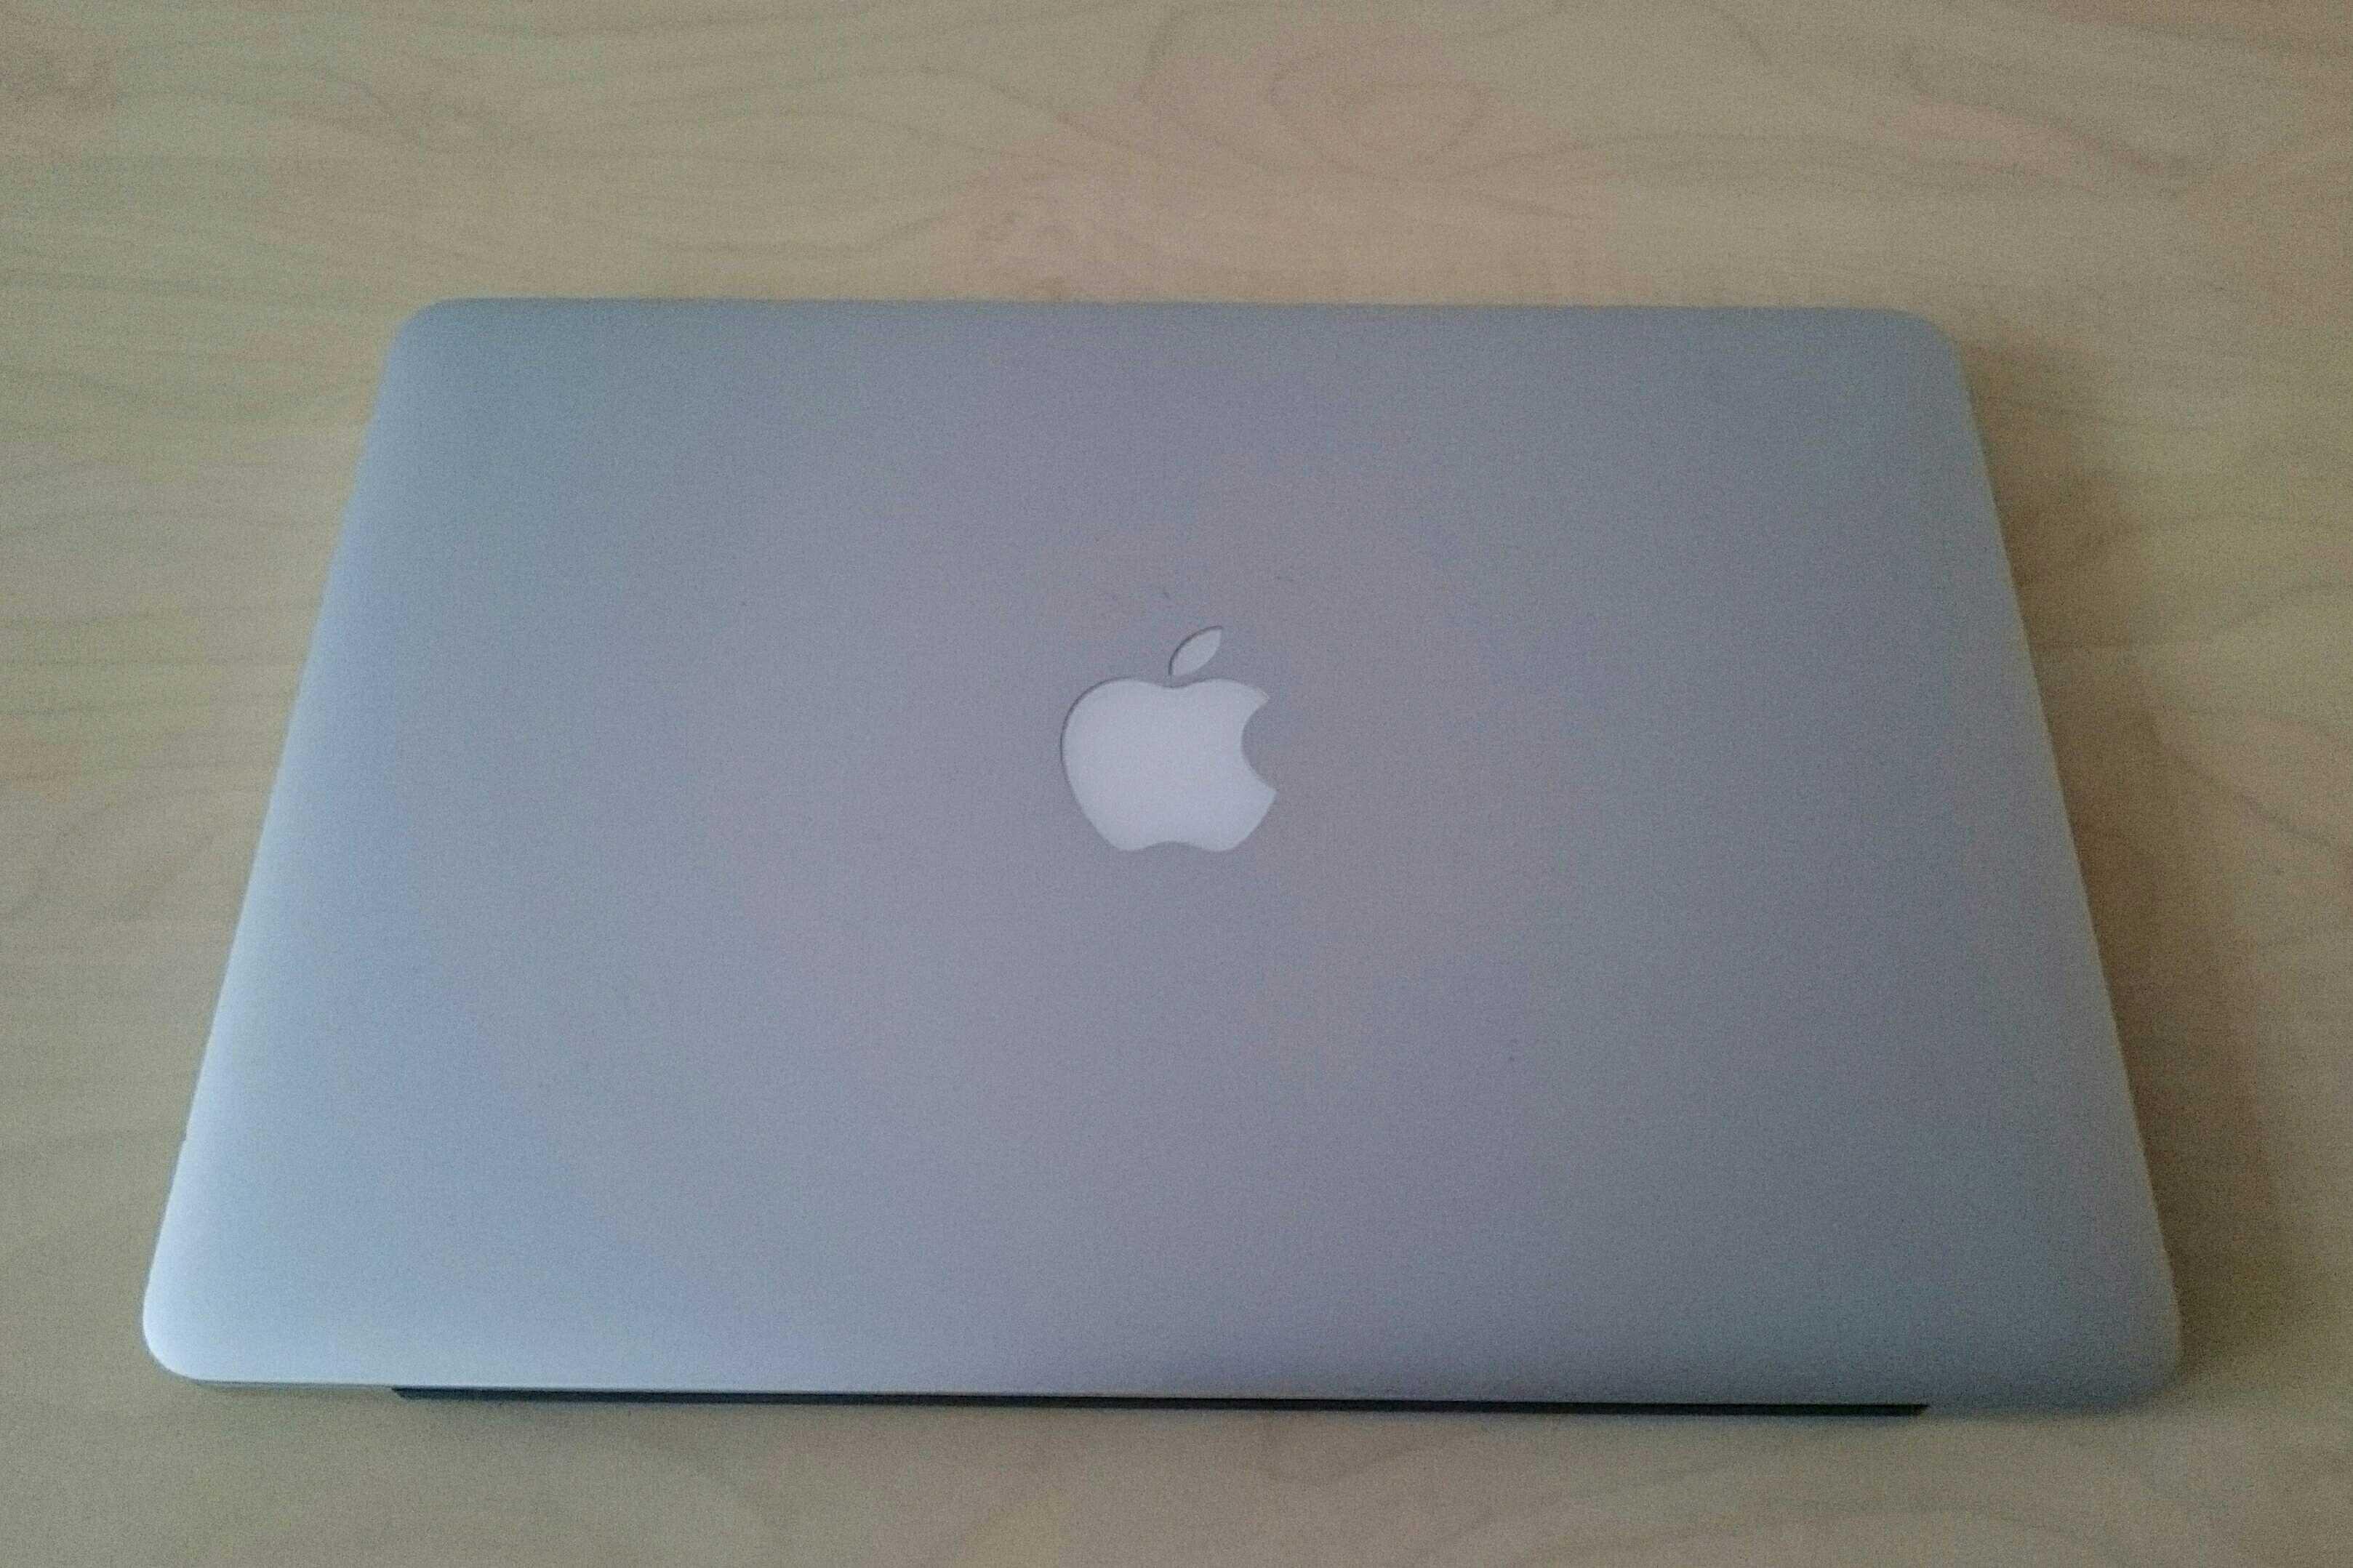 MacBook Pro (Retina, 13-inch, 2015)